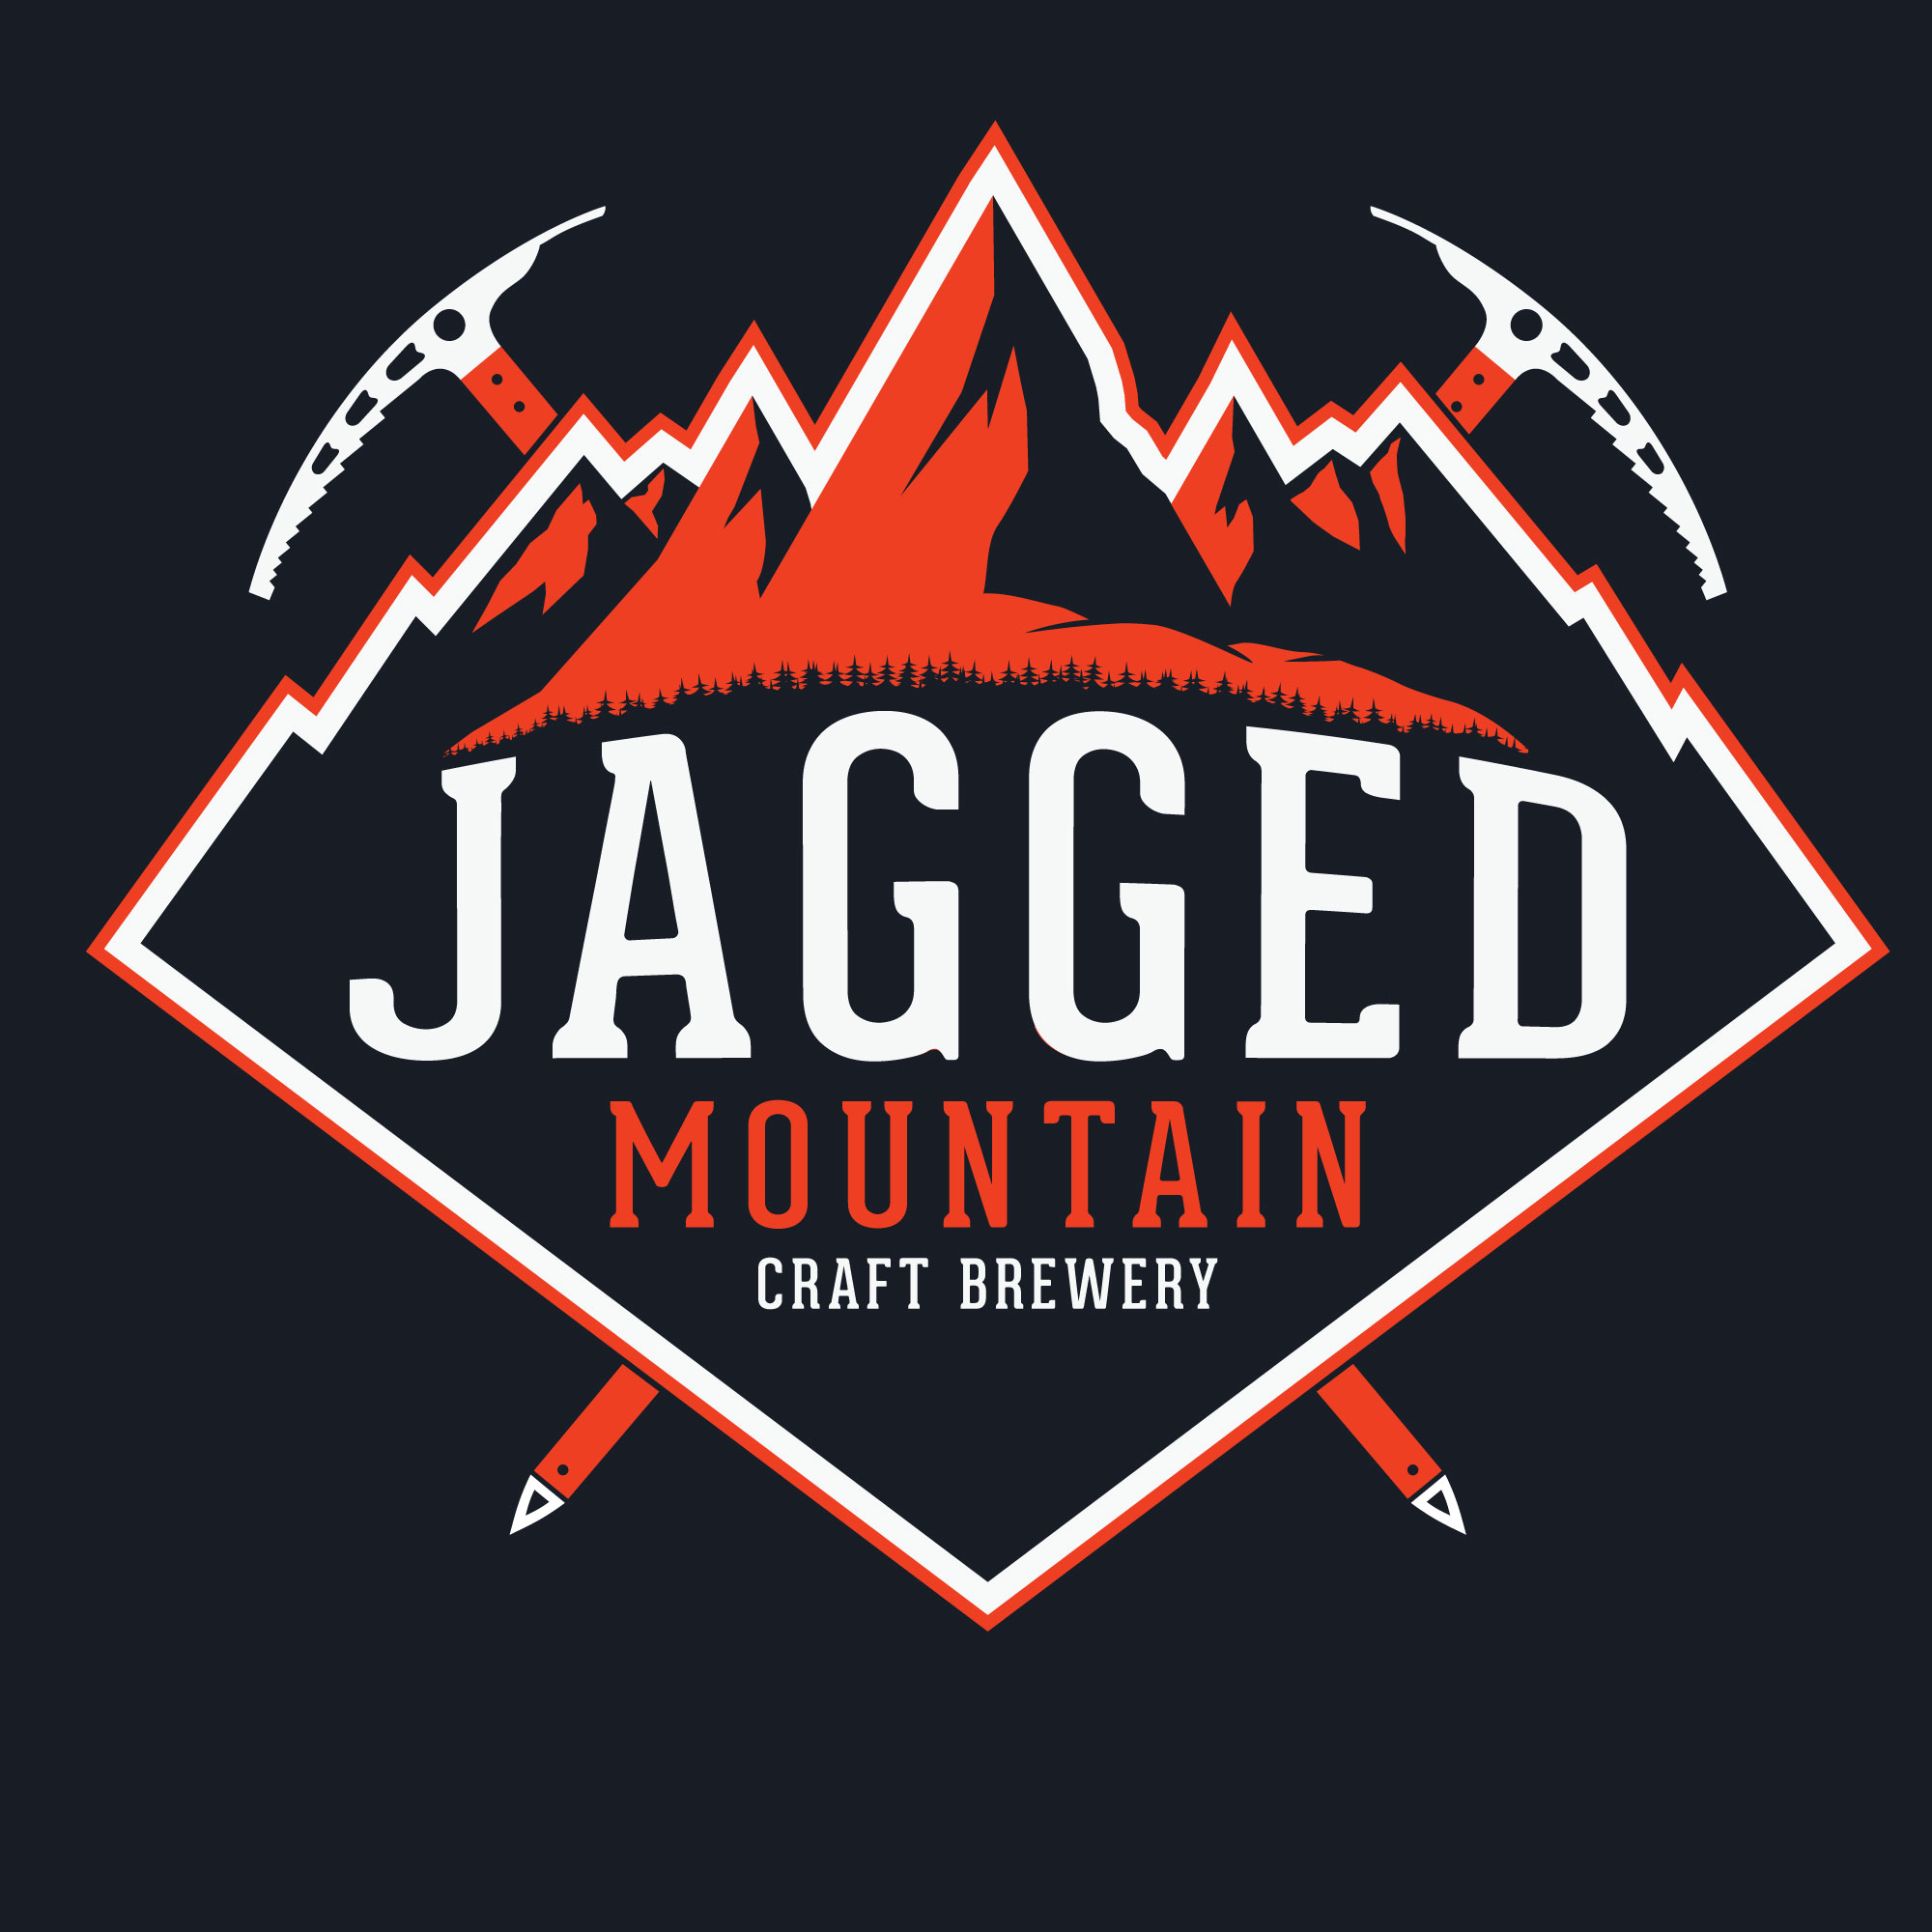 Jagged Mountain Craft Brewery jobs